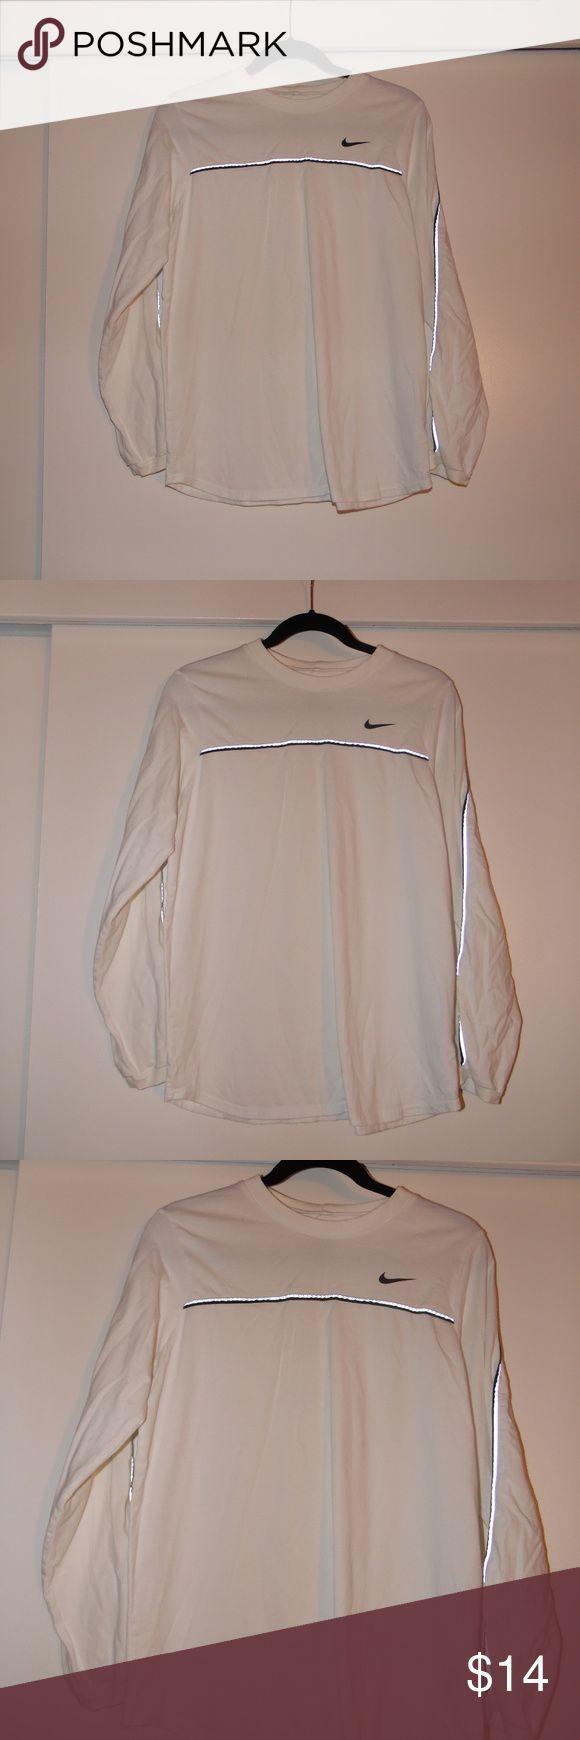 Nike Workout Shirt White long sleeve Nike workout top. Nike Tops Tees - Long Sleeve